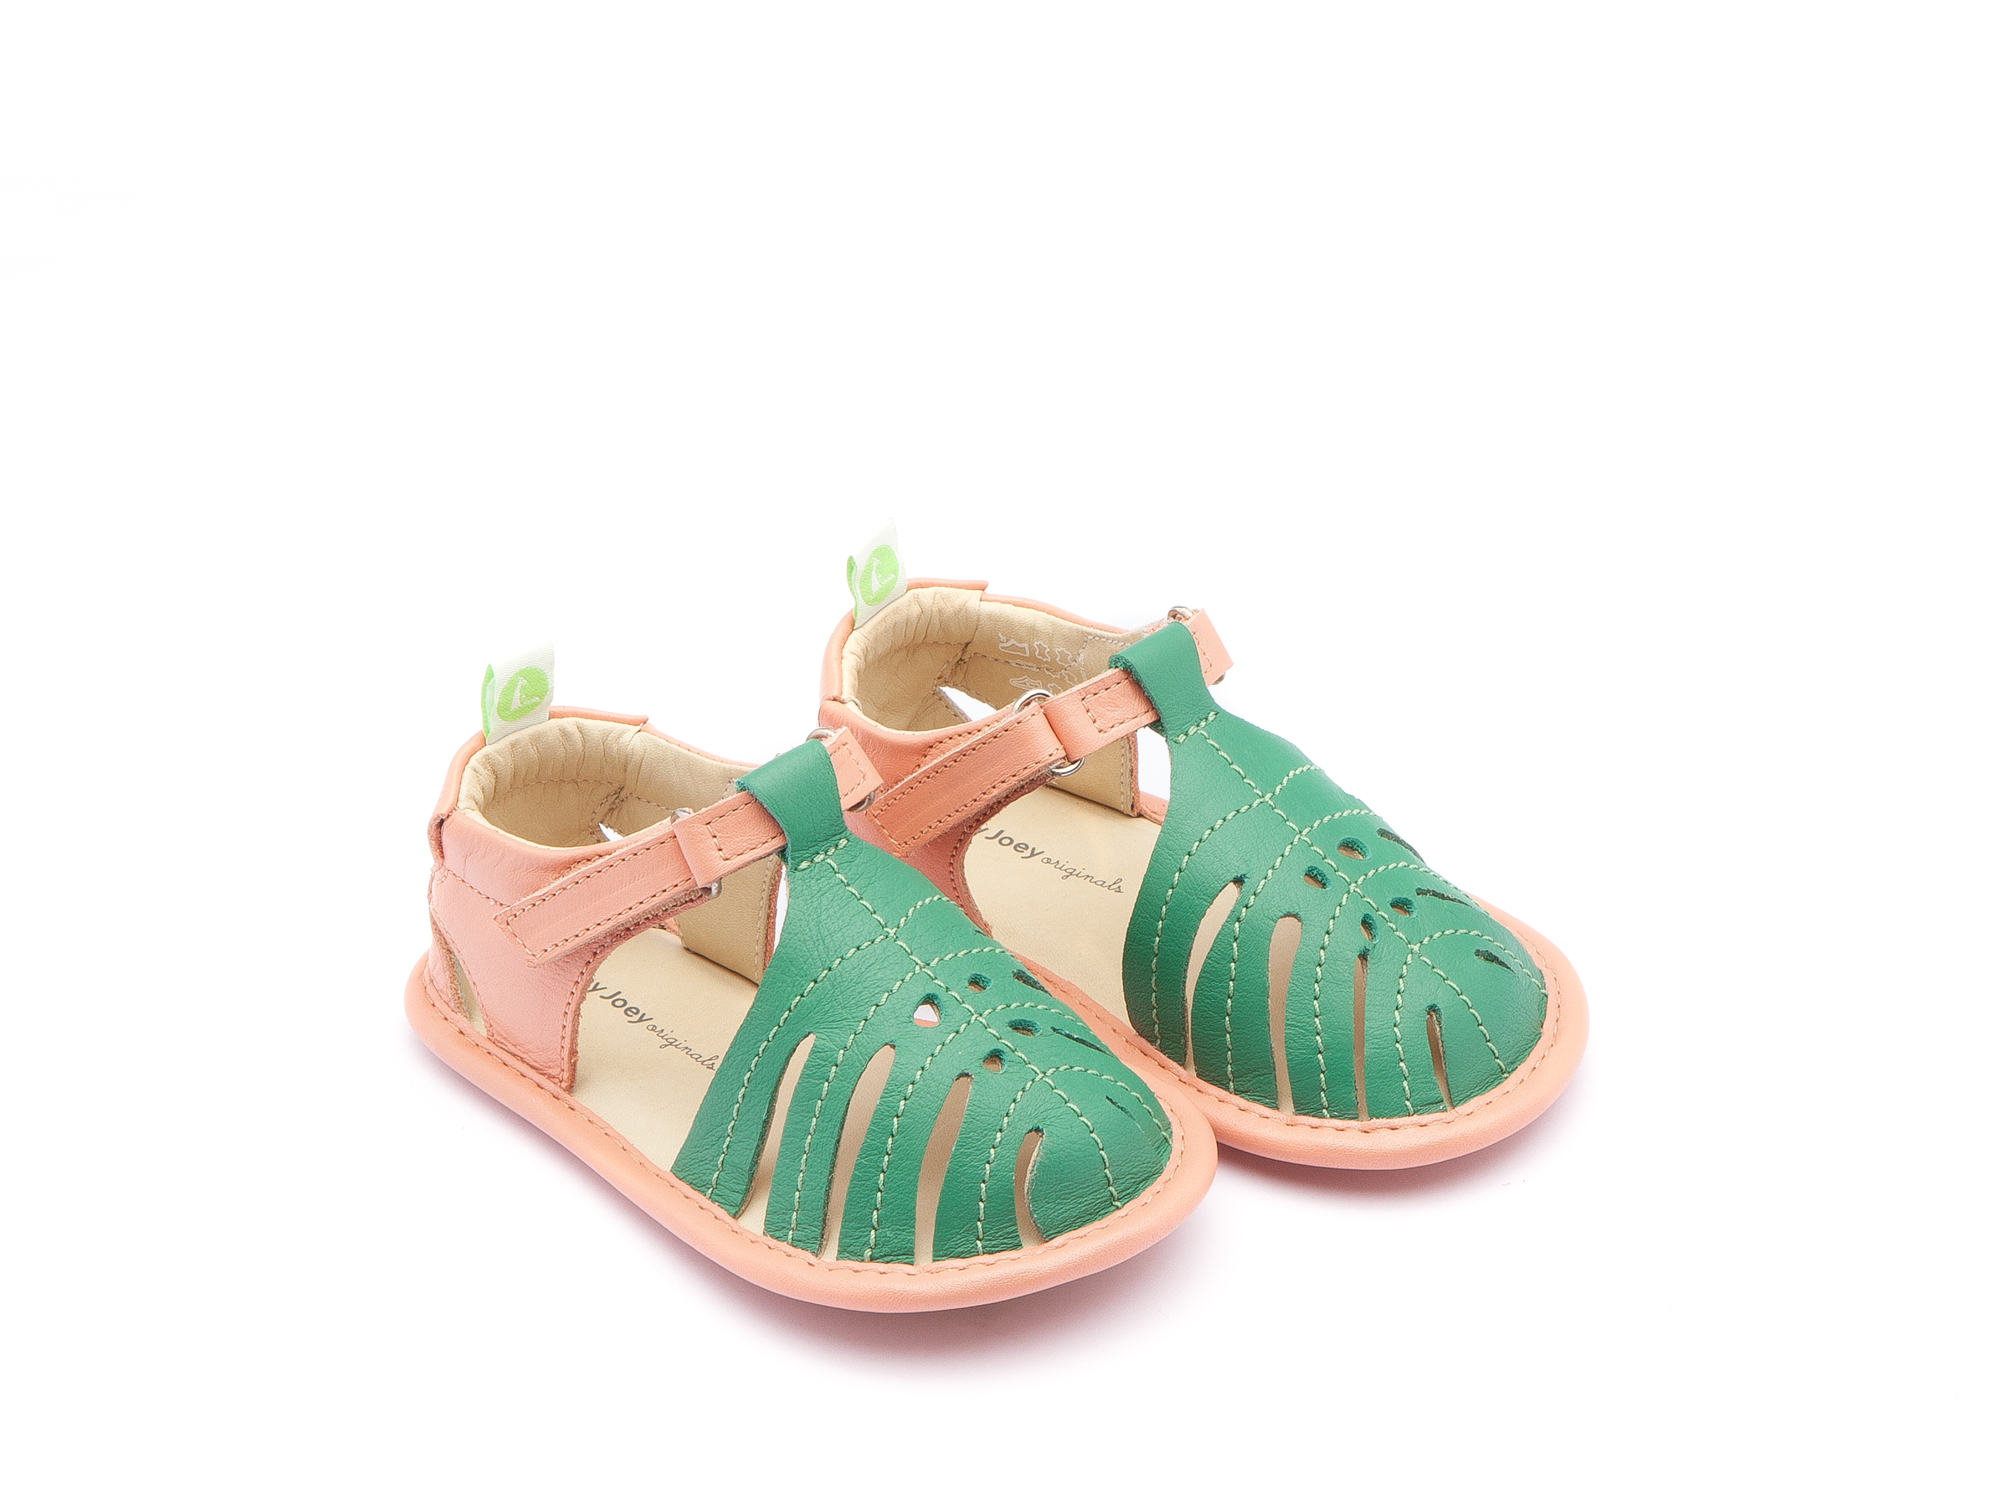 Sandália Tropically Green Leaf/ Flamingo Baby 0 à 2 anos - 0